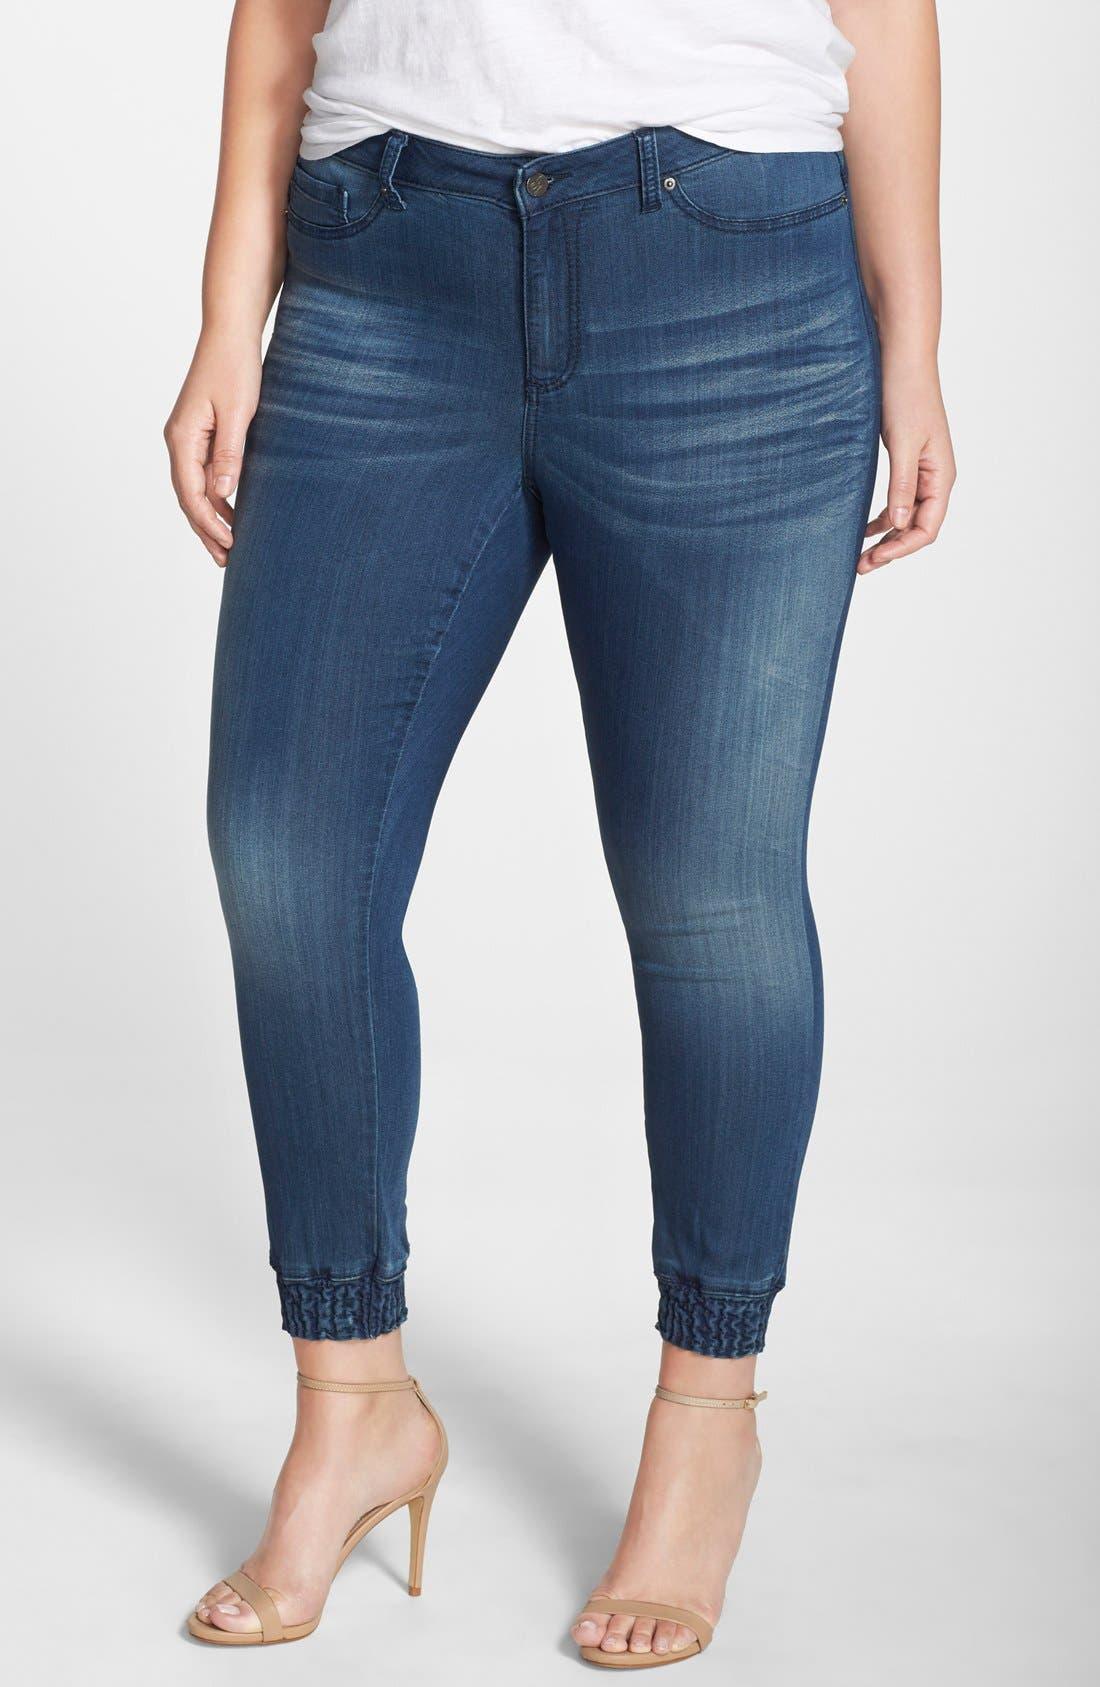 Plus Women's Poetic Justice 'Suzzie' Stretch Knit Denim Crop Jeans